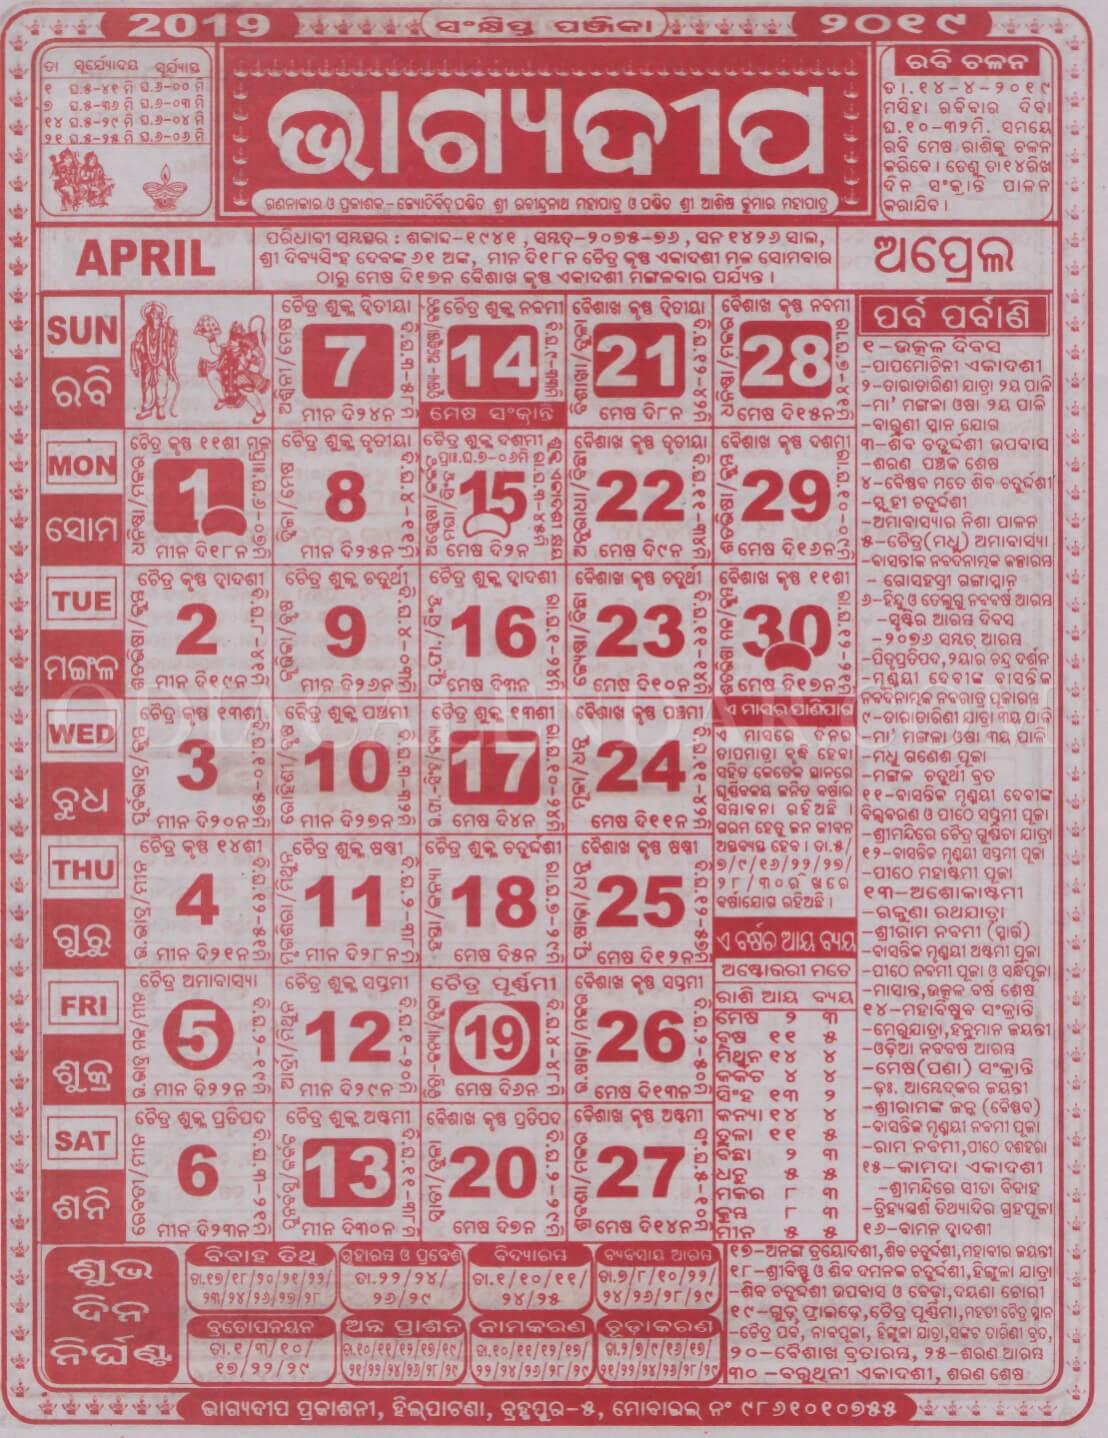 Bhagyadeep Odia Calendar 2019 | Odia Calendar 2019 | Odia for Odia Calendar Bhagyadeep